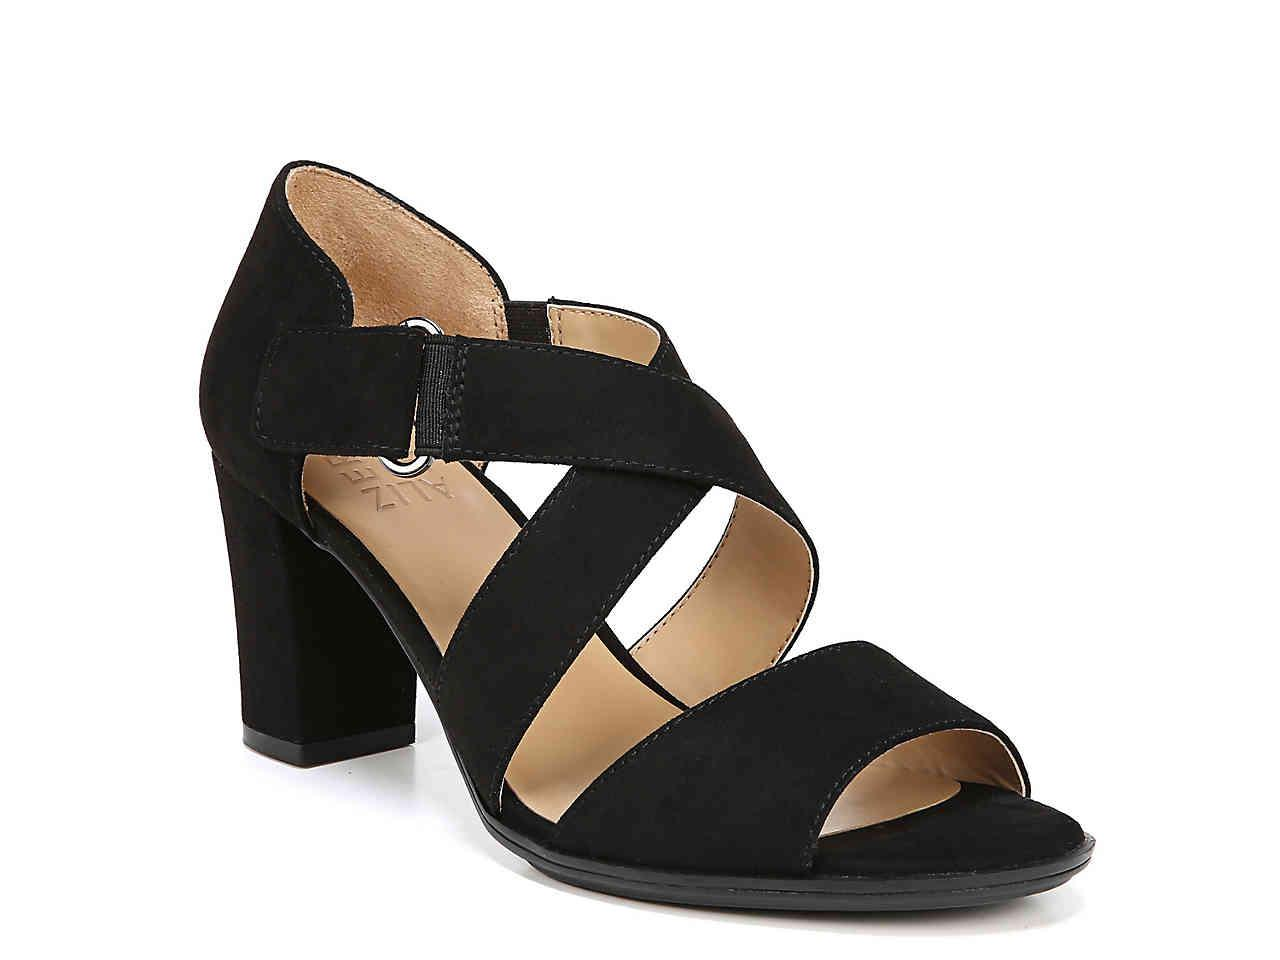 25f0e6c93dd0 Lyst - Naturalizer Lindy Dress Sandals in Black - Save 17%